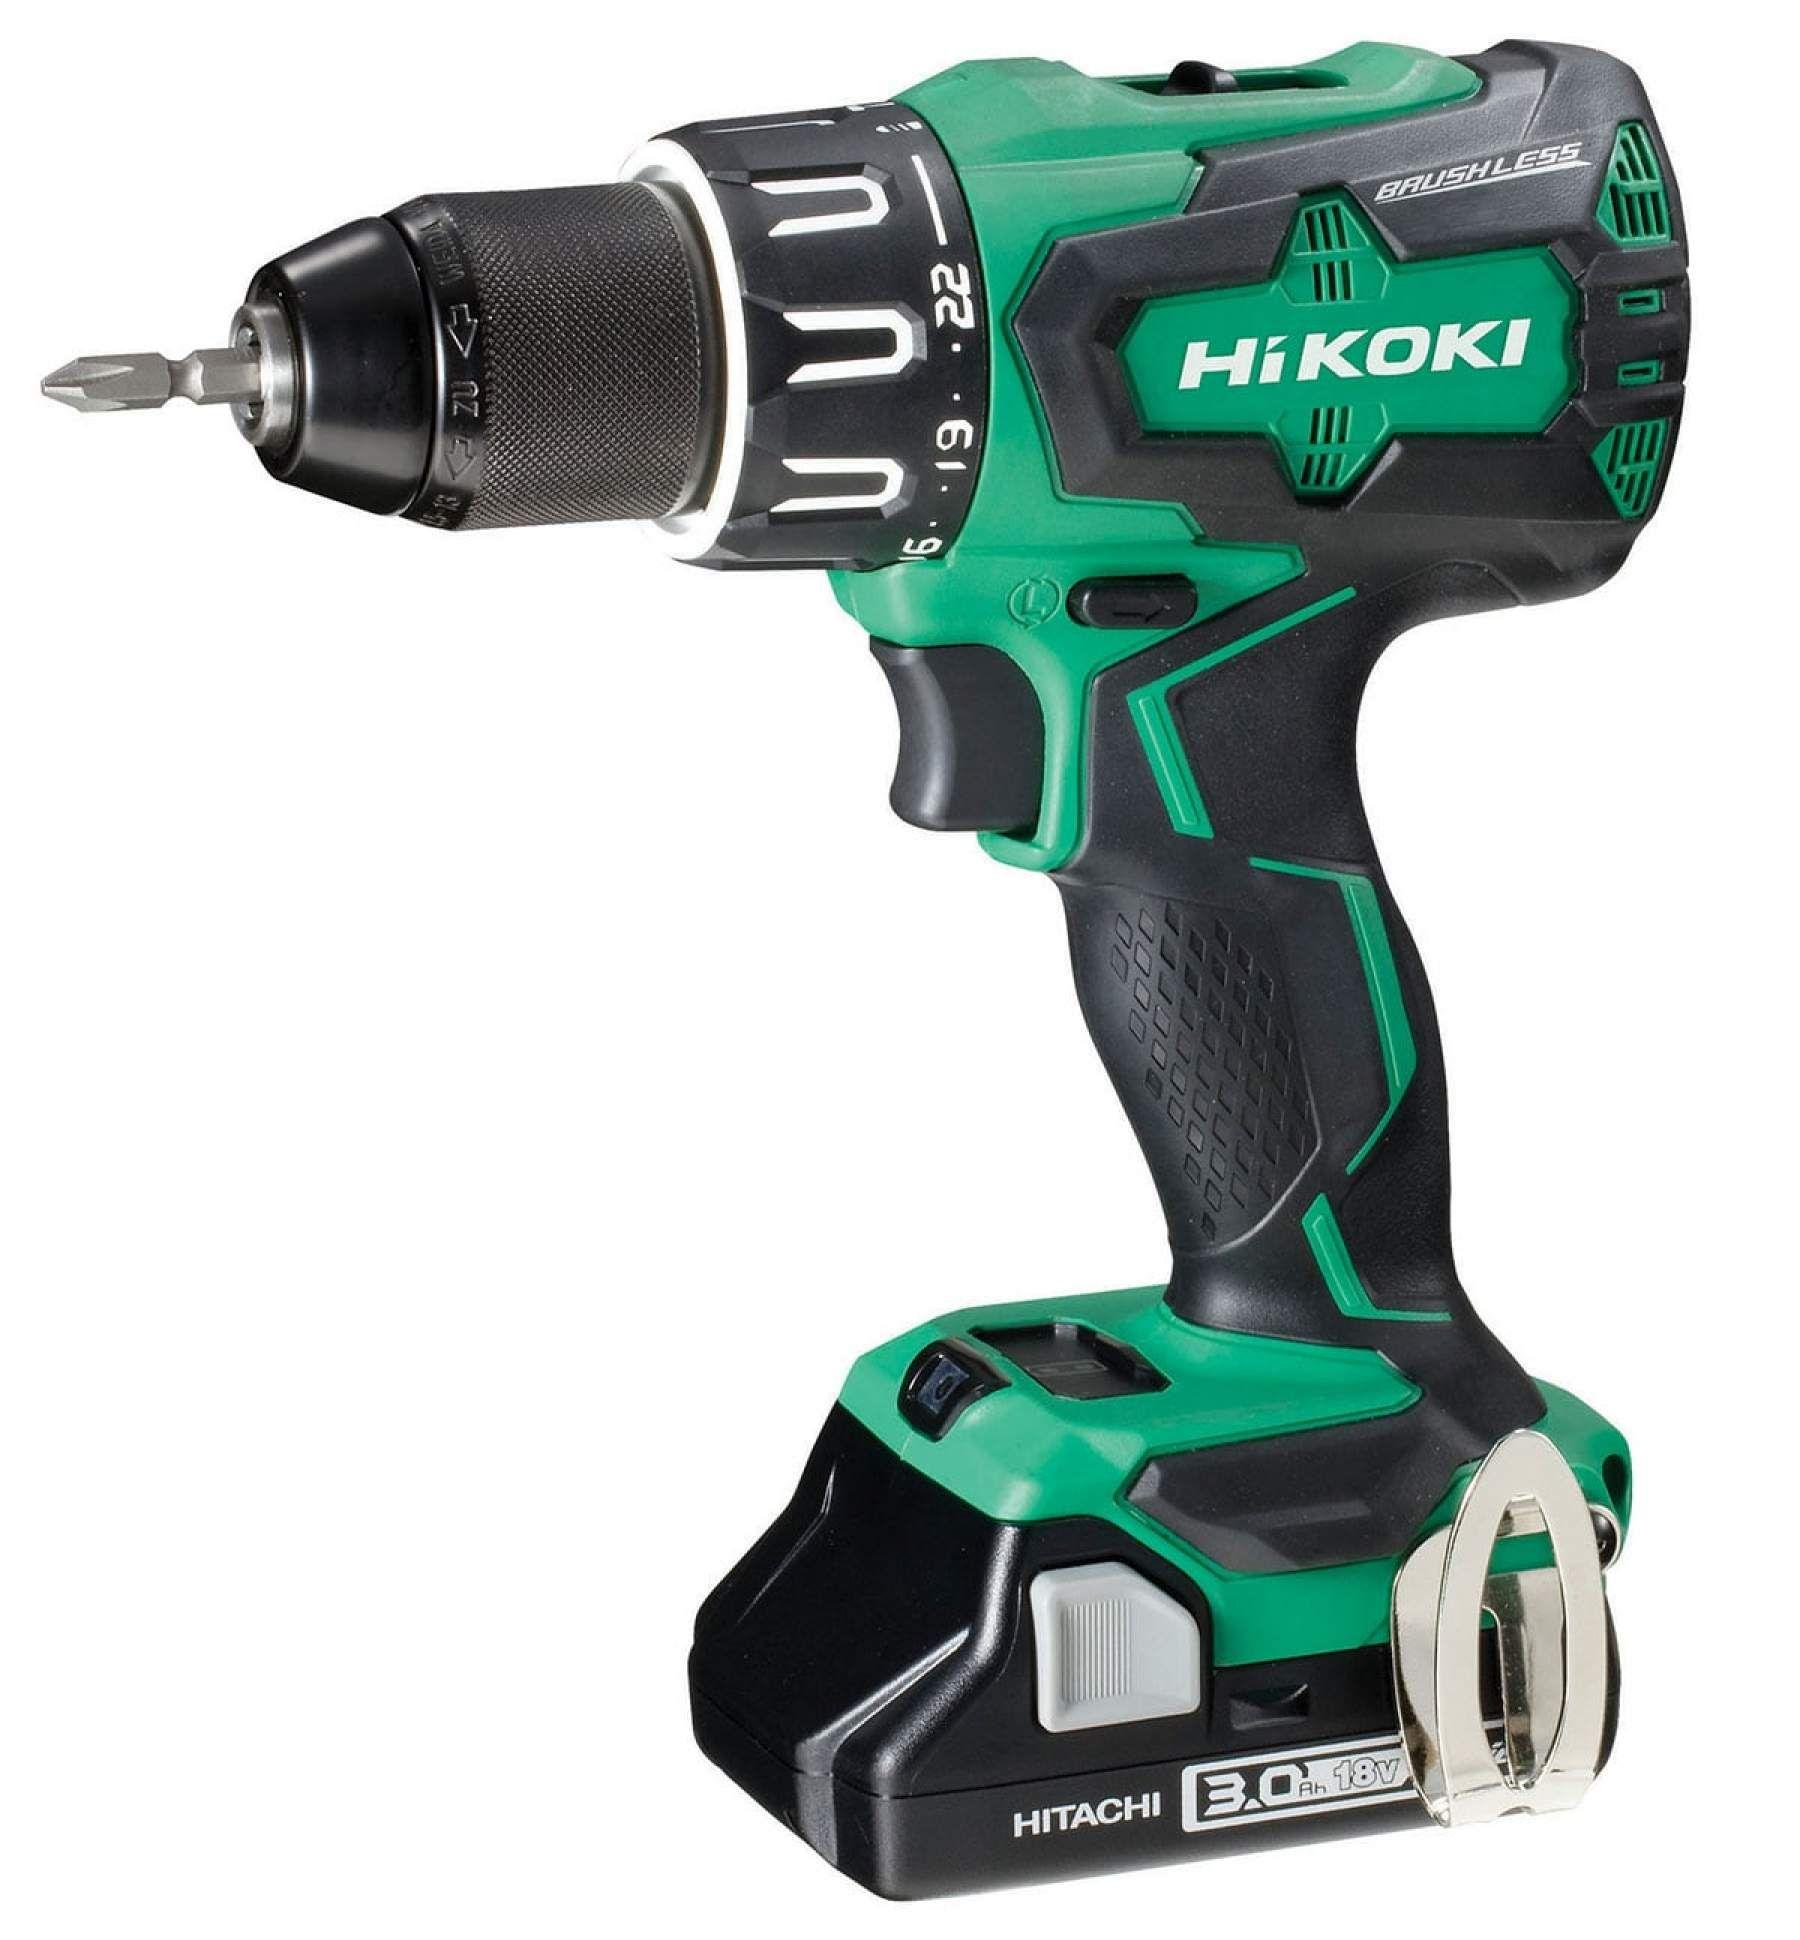 Hitachi Koki 18v Cordless Drill 1 x 3.0Ah DV18DBFL2 Brushless Combi Worklight £79.99 primeretailing eBay